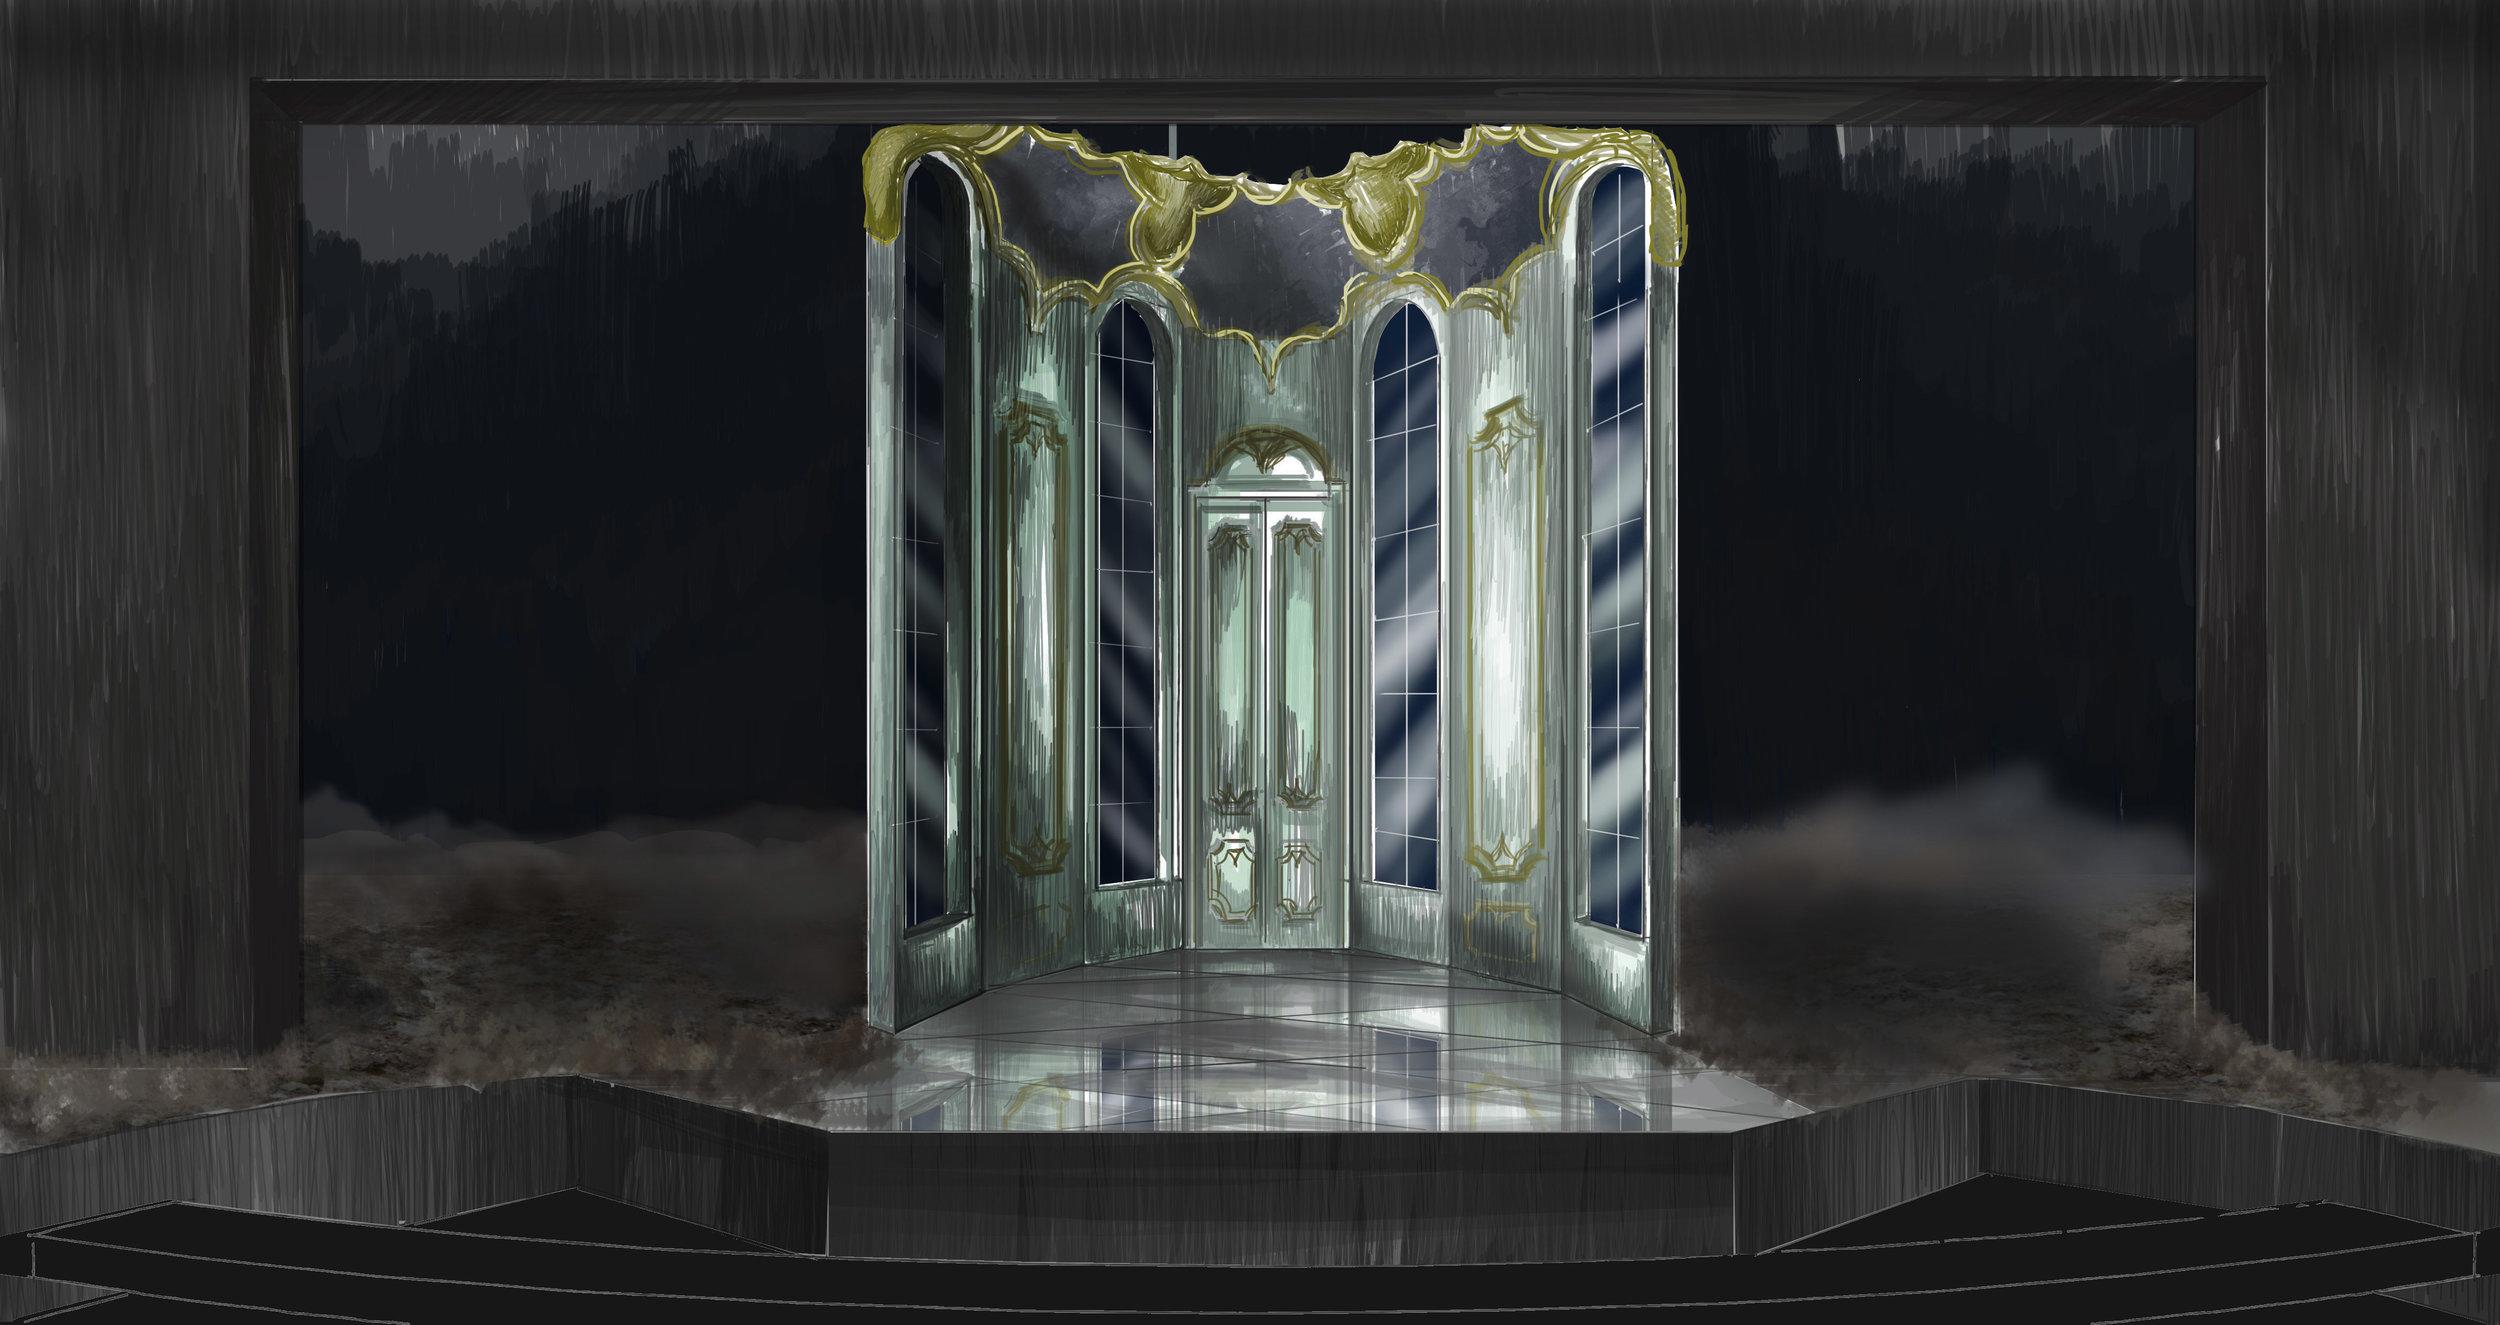 Theatre rendering for 'Les Liaisons Dangereuses' by Christopher Hampton (unrealized paper project)